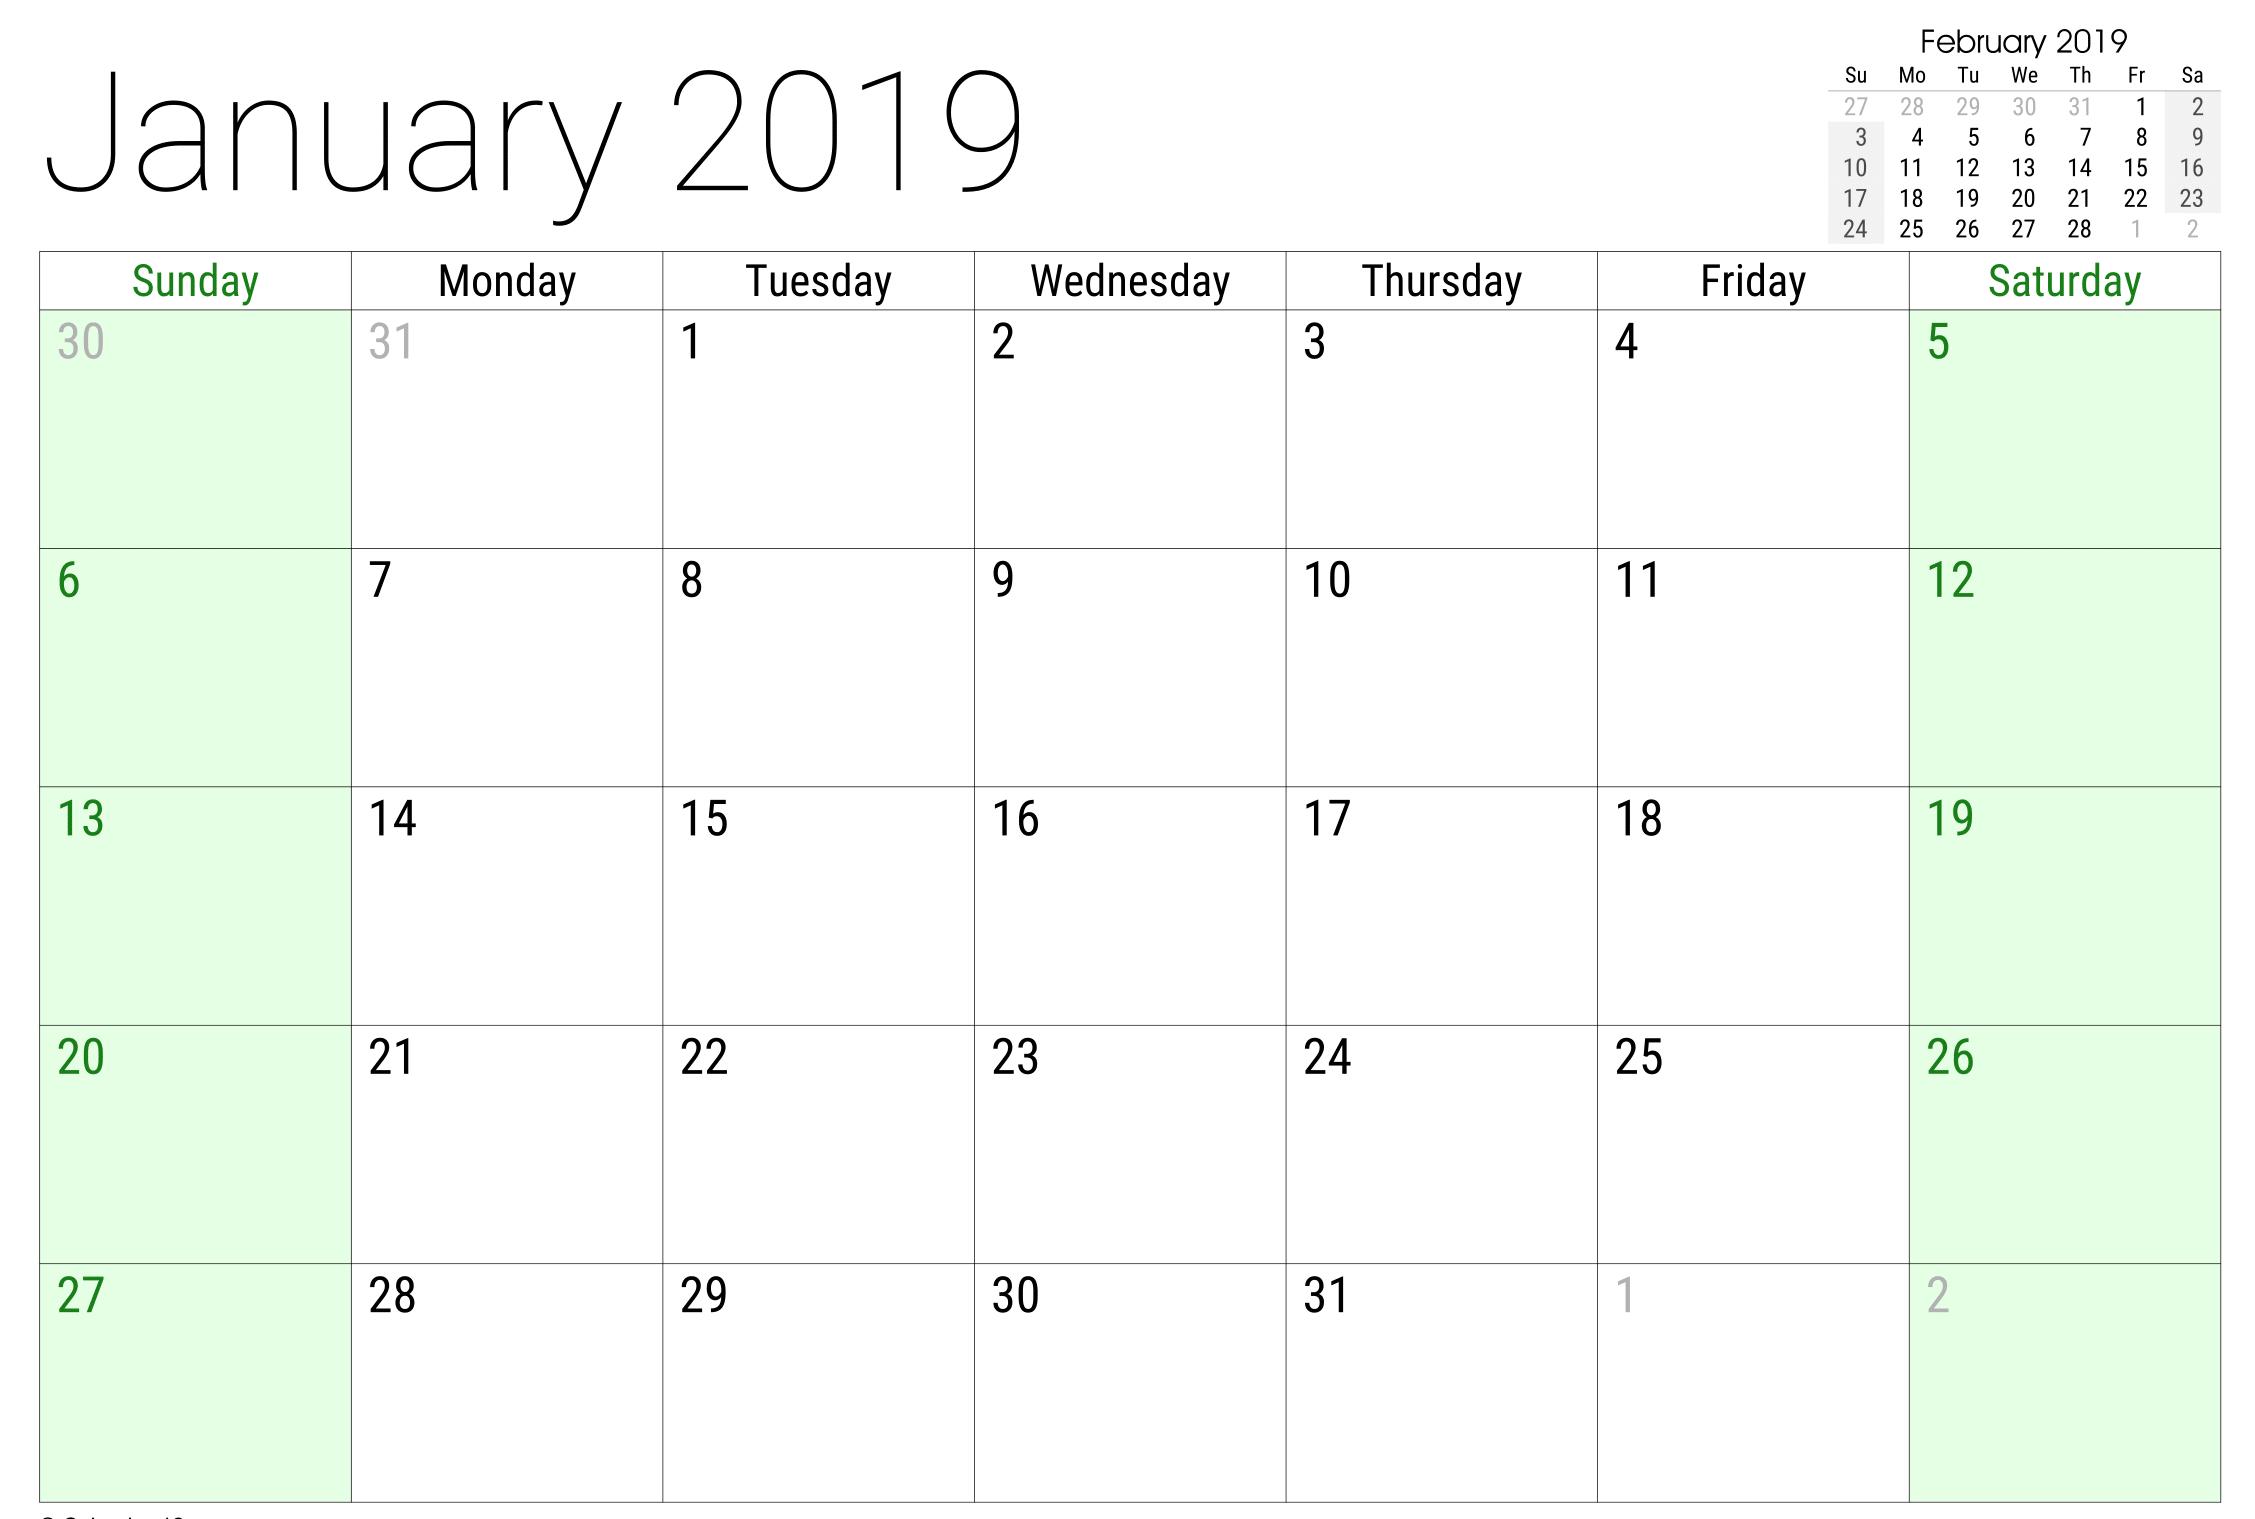 January 2019 Google Sheet Calendar | 2019 Calendar, Calendar